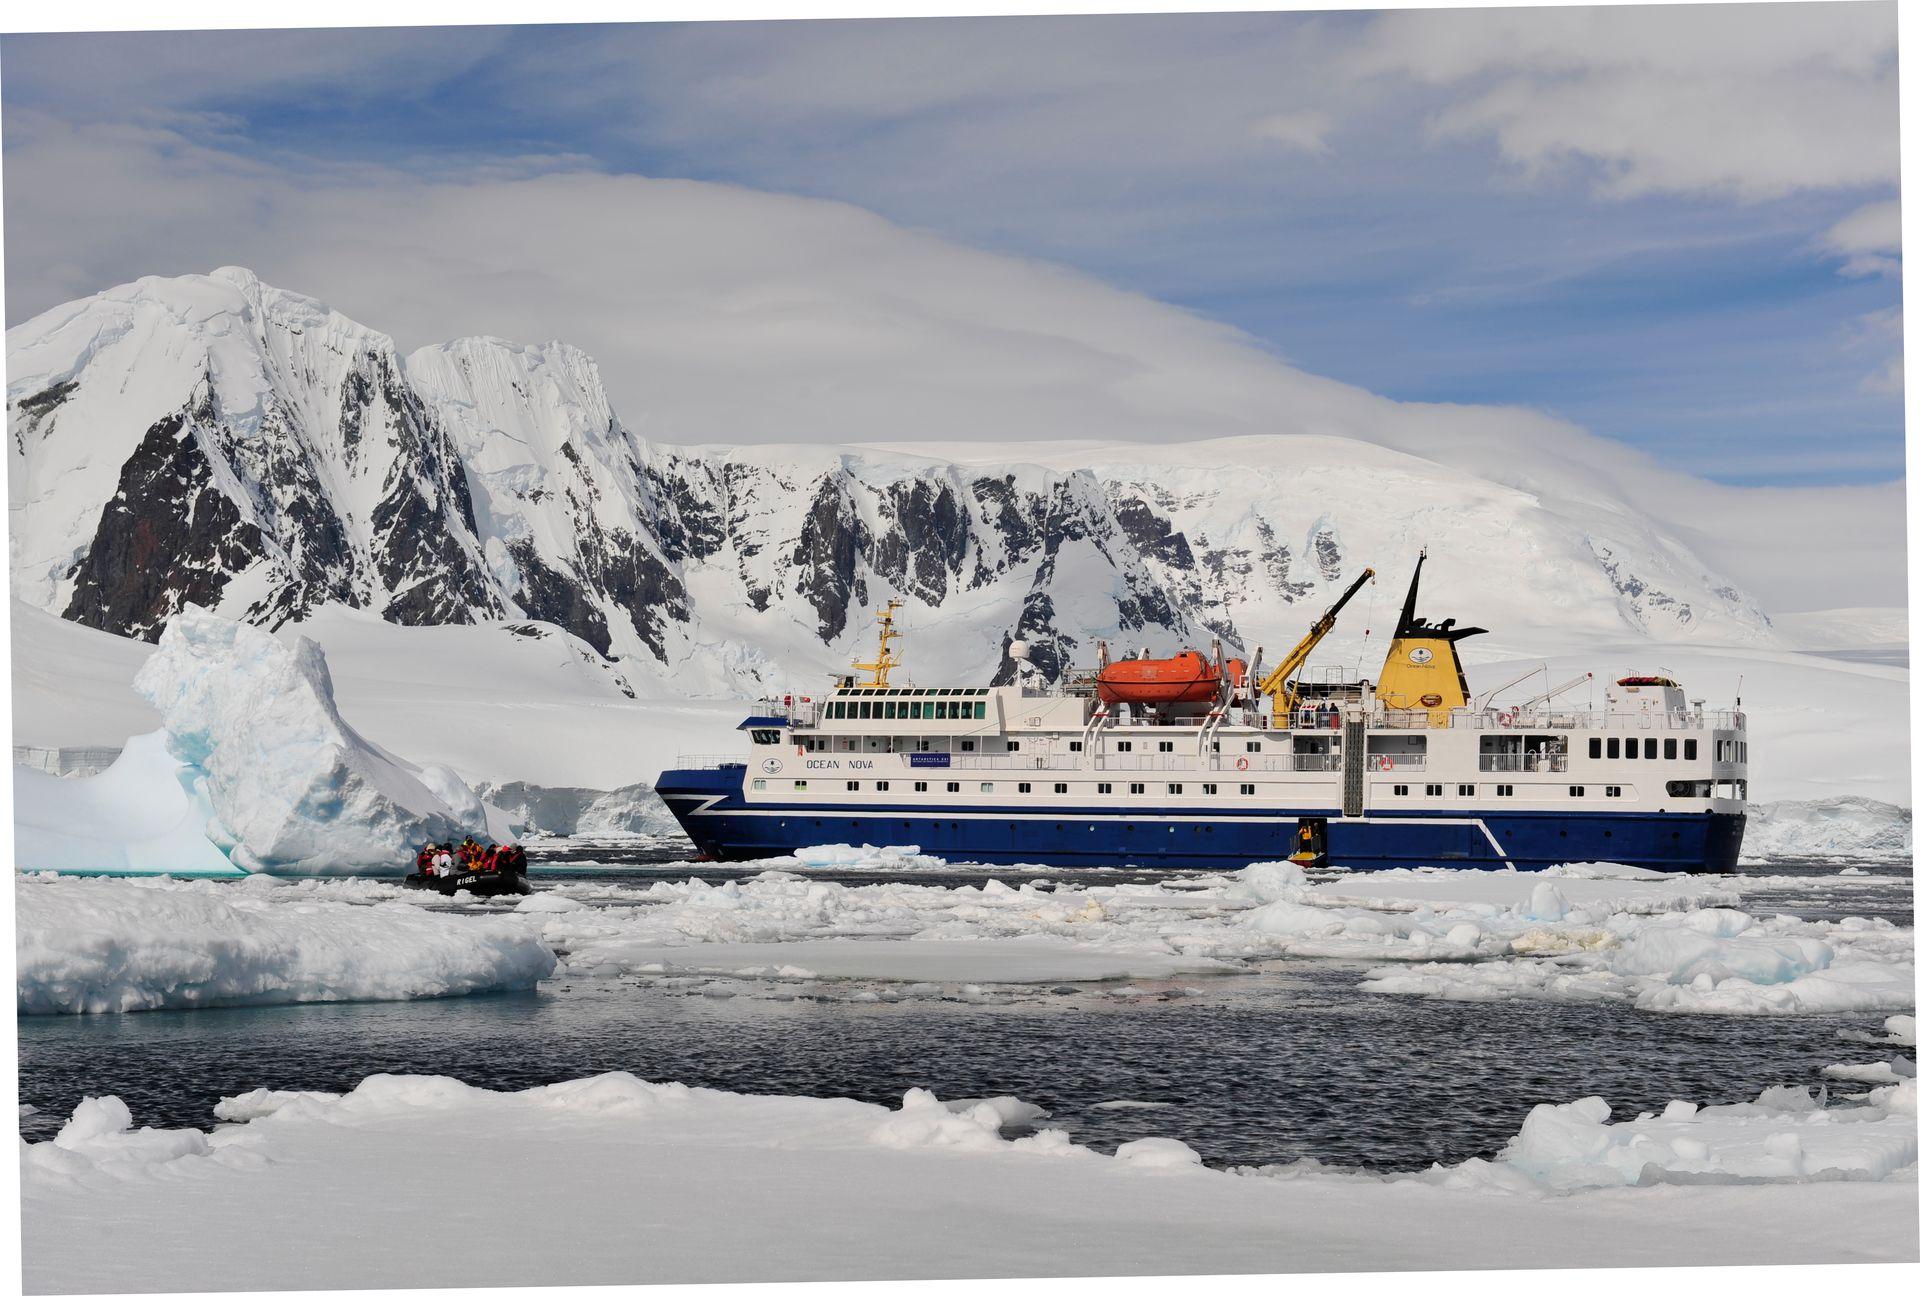 Cute Cruise Ship Quotes Quotesgram: M/V Ocean Nova, Antarctica